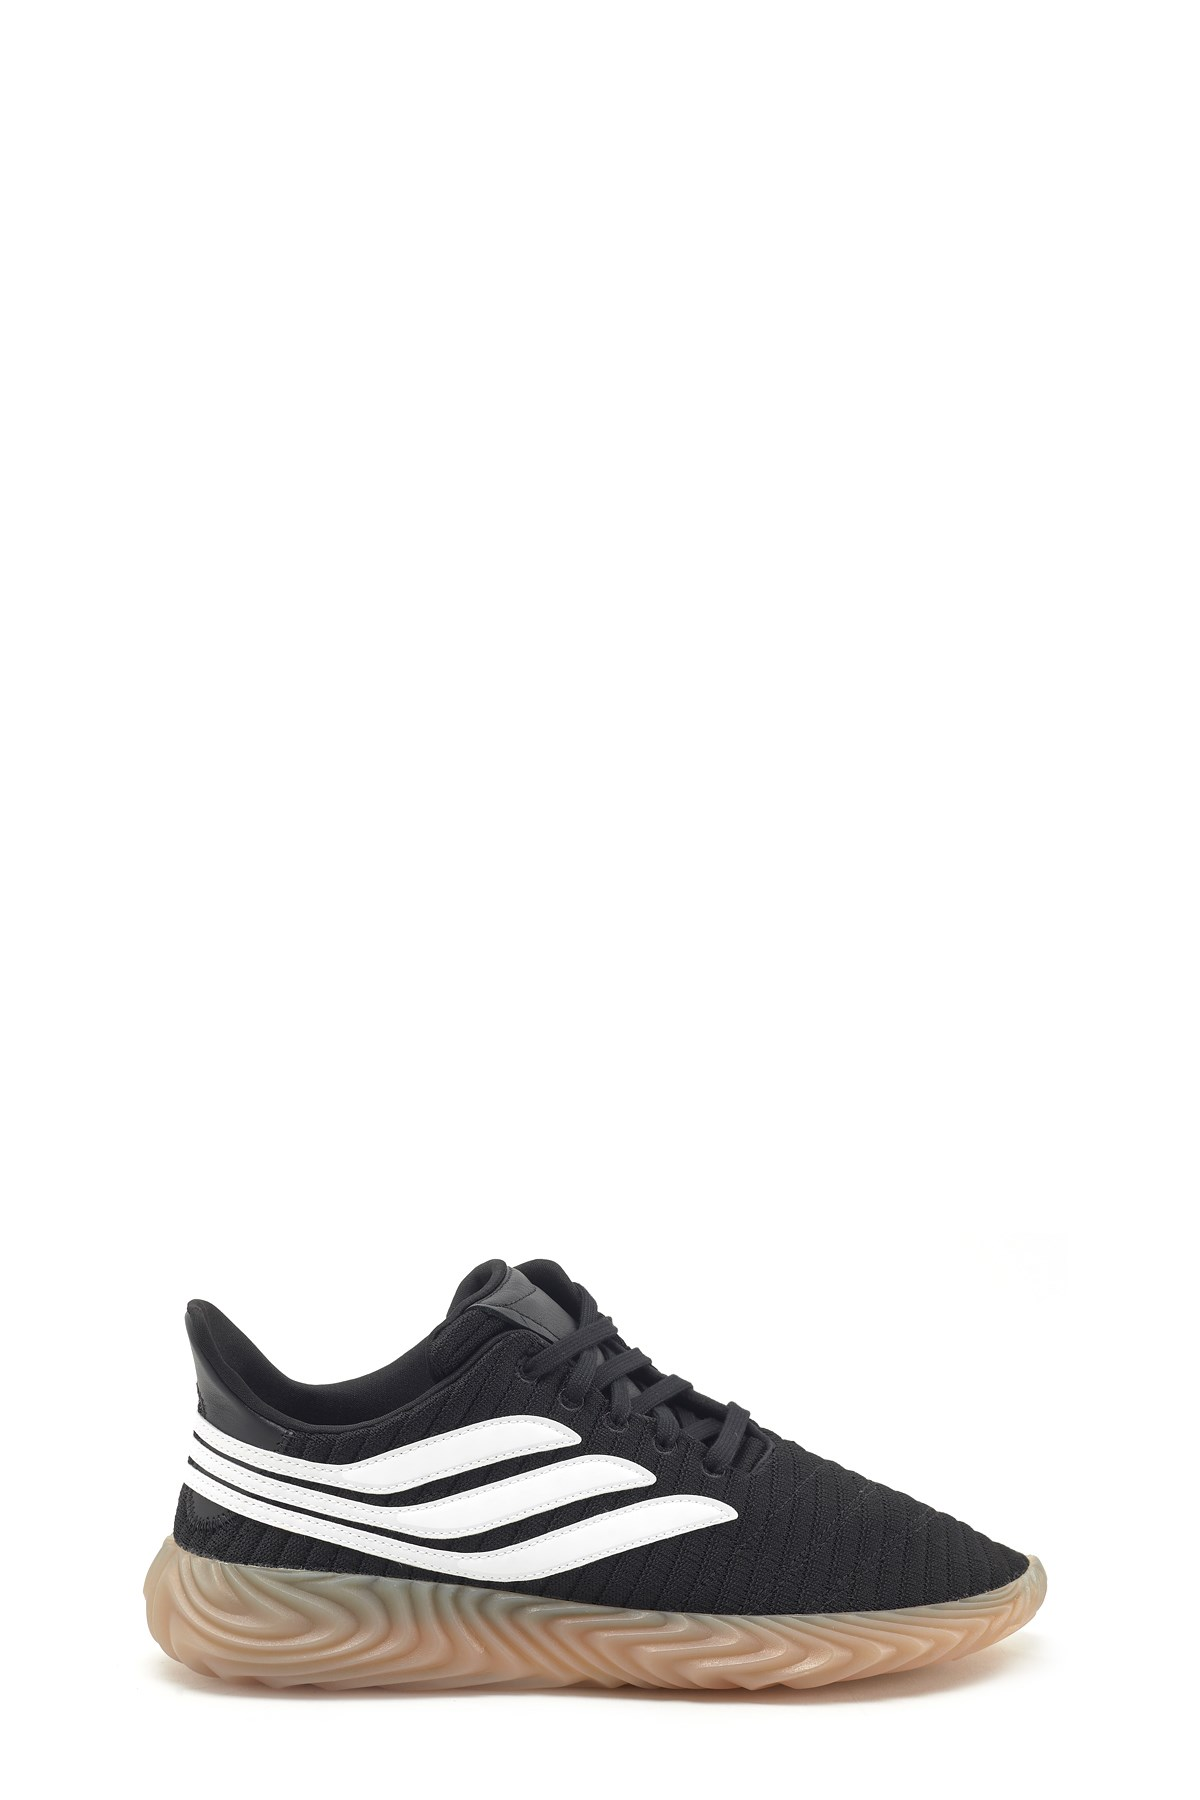 classic fit 505f0 935fc ADIDAS ORIGINALS sneaker  sobakov  - COD. AQ1135COREBLACK